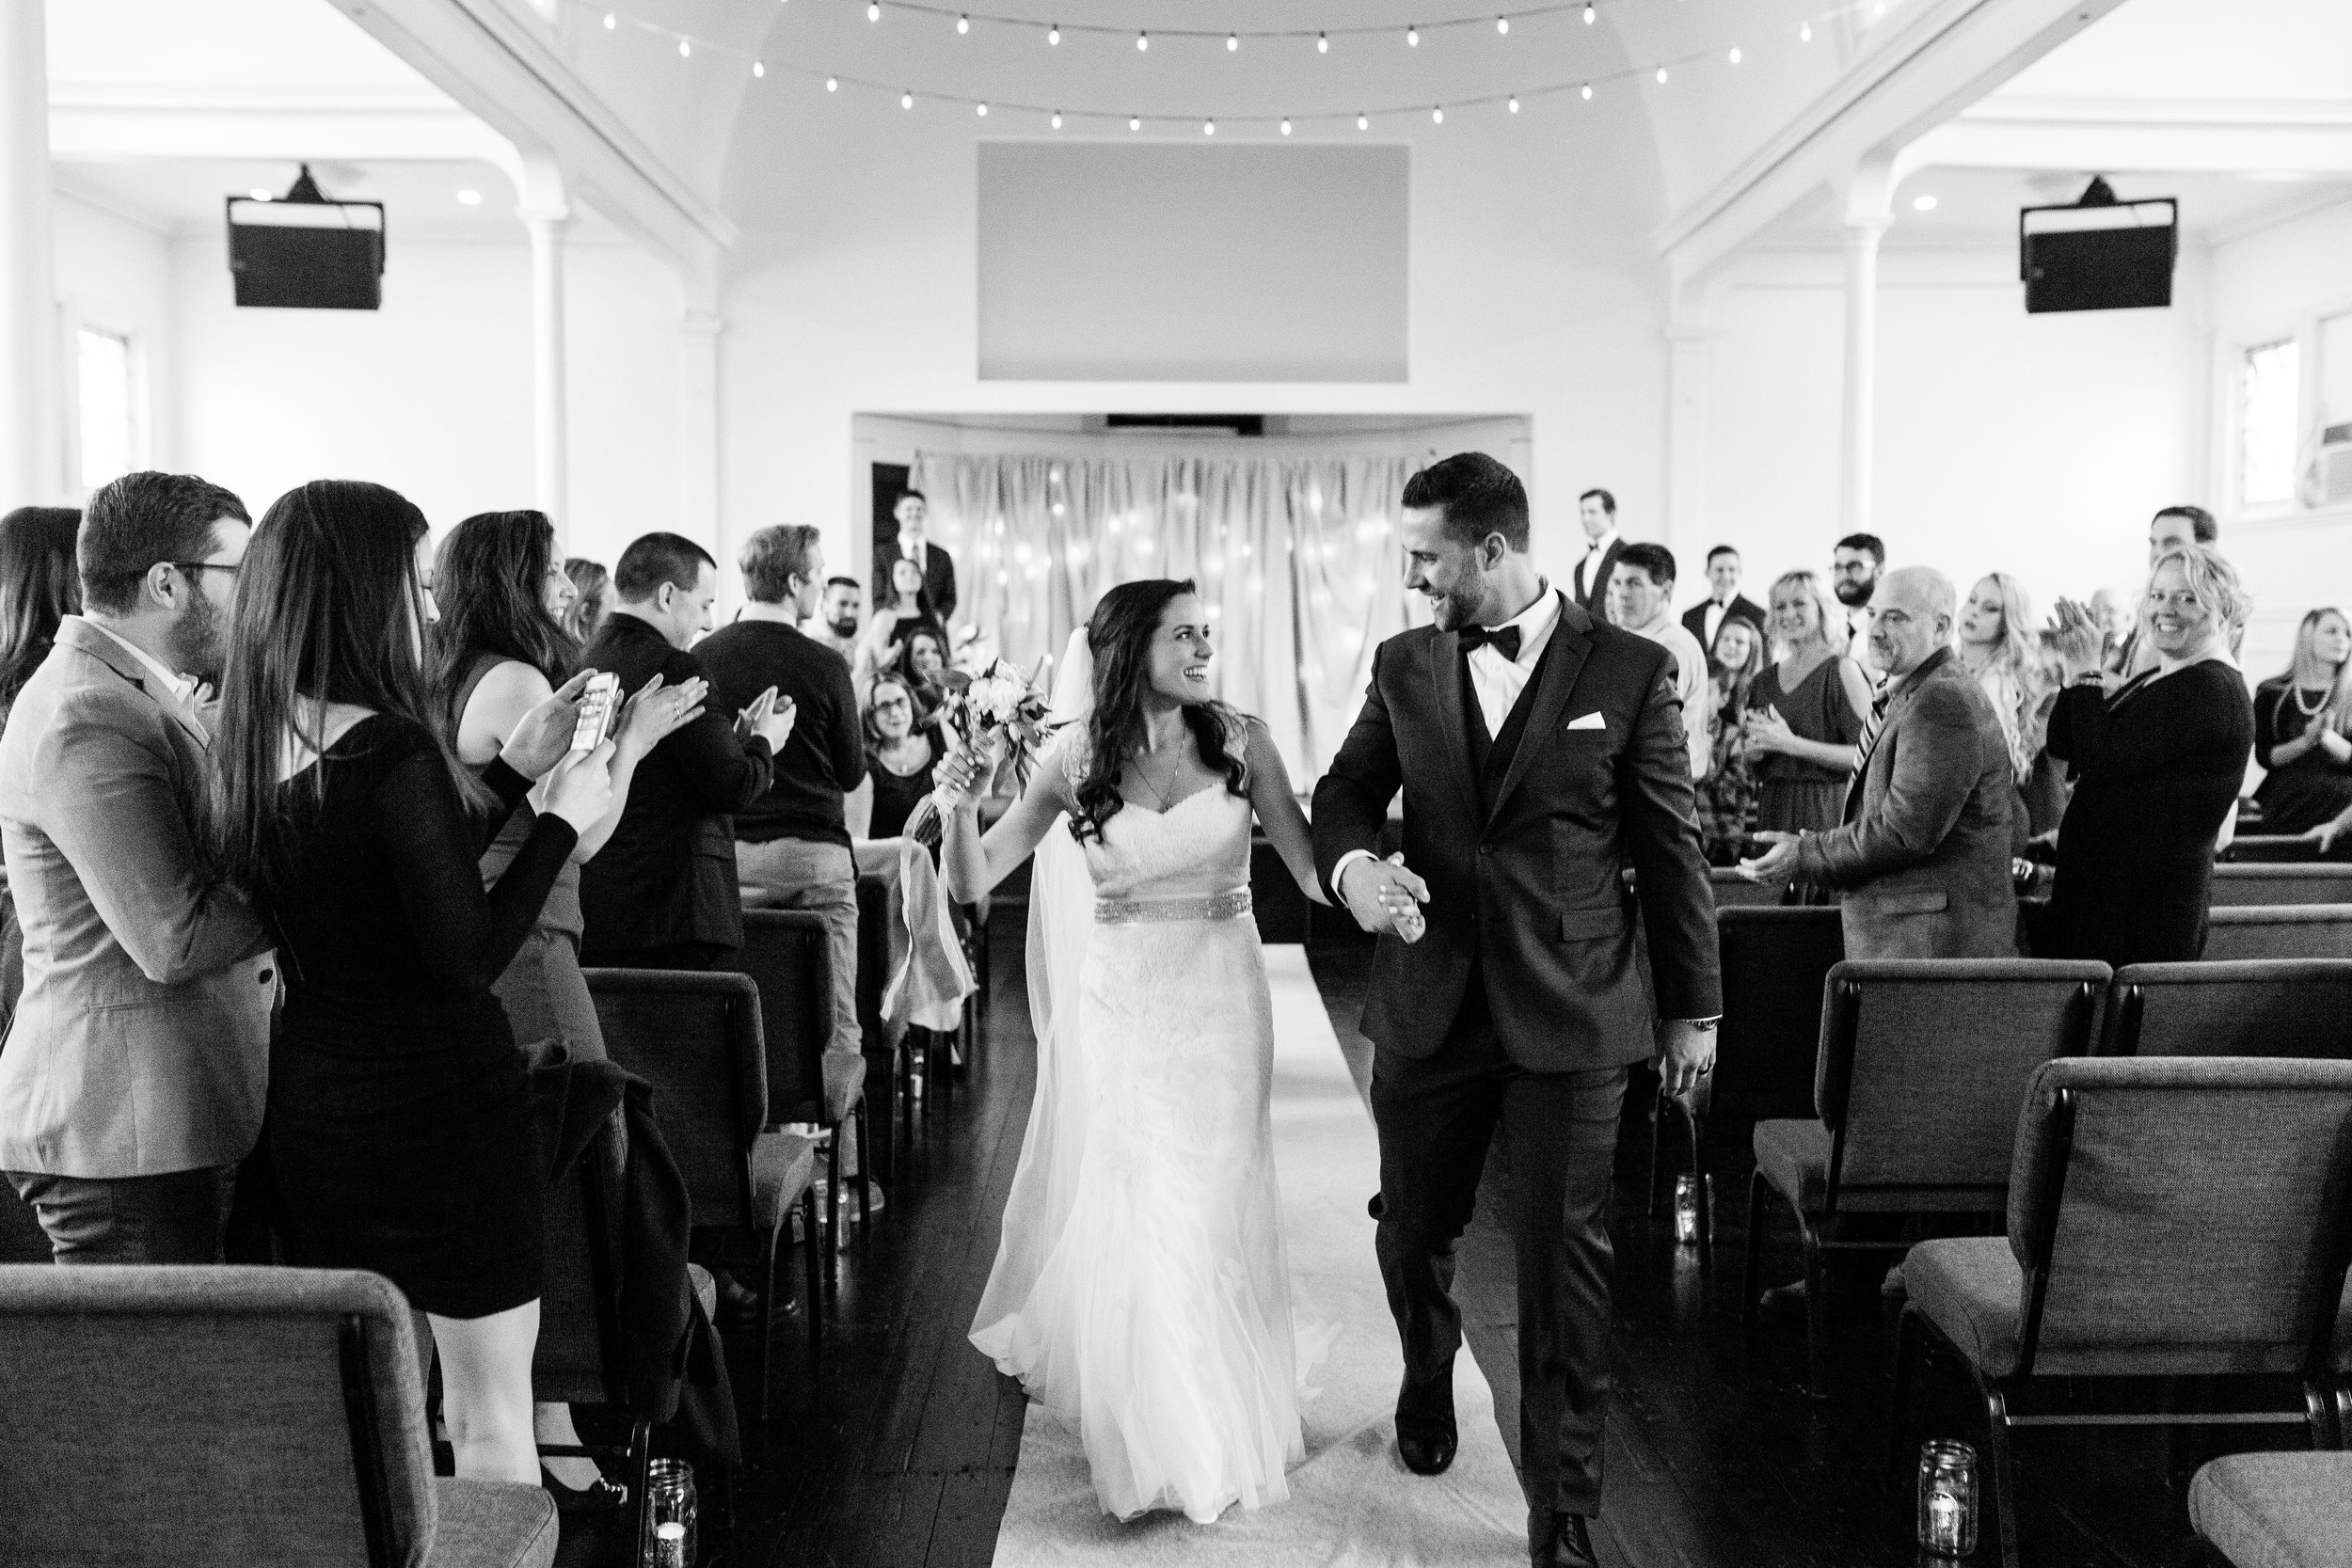 nicole-daacke-photography-boston-massachusetts-seaside-intimate-winter-wedding-photographer-15.jpg